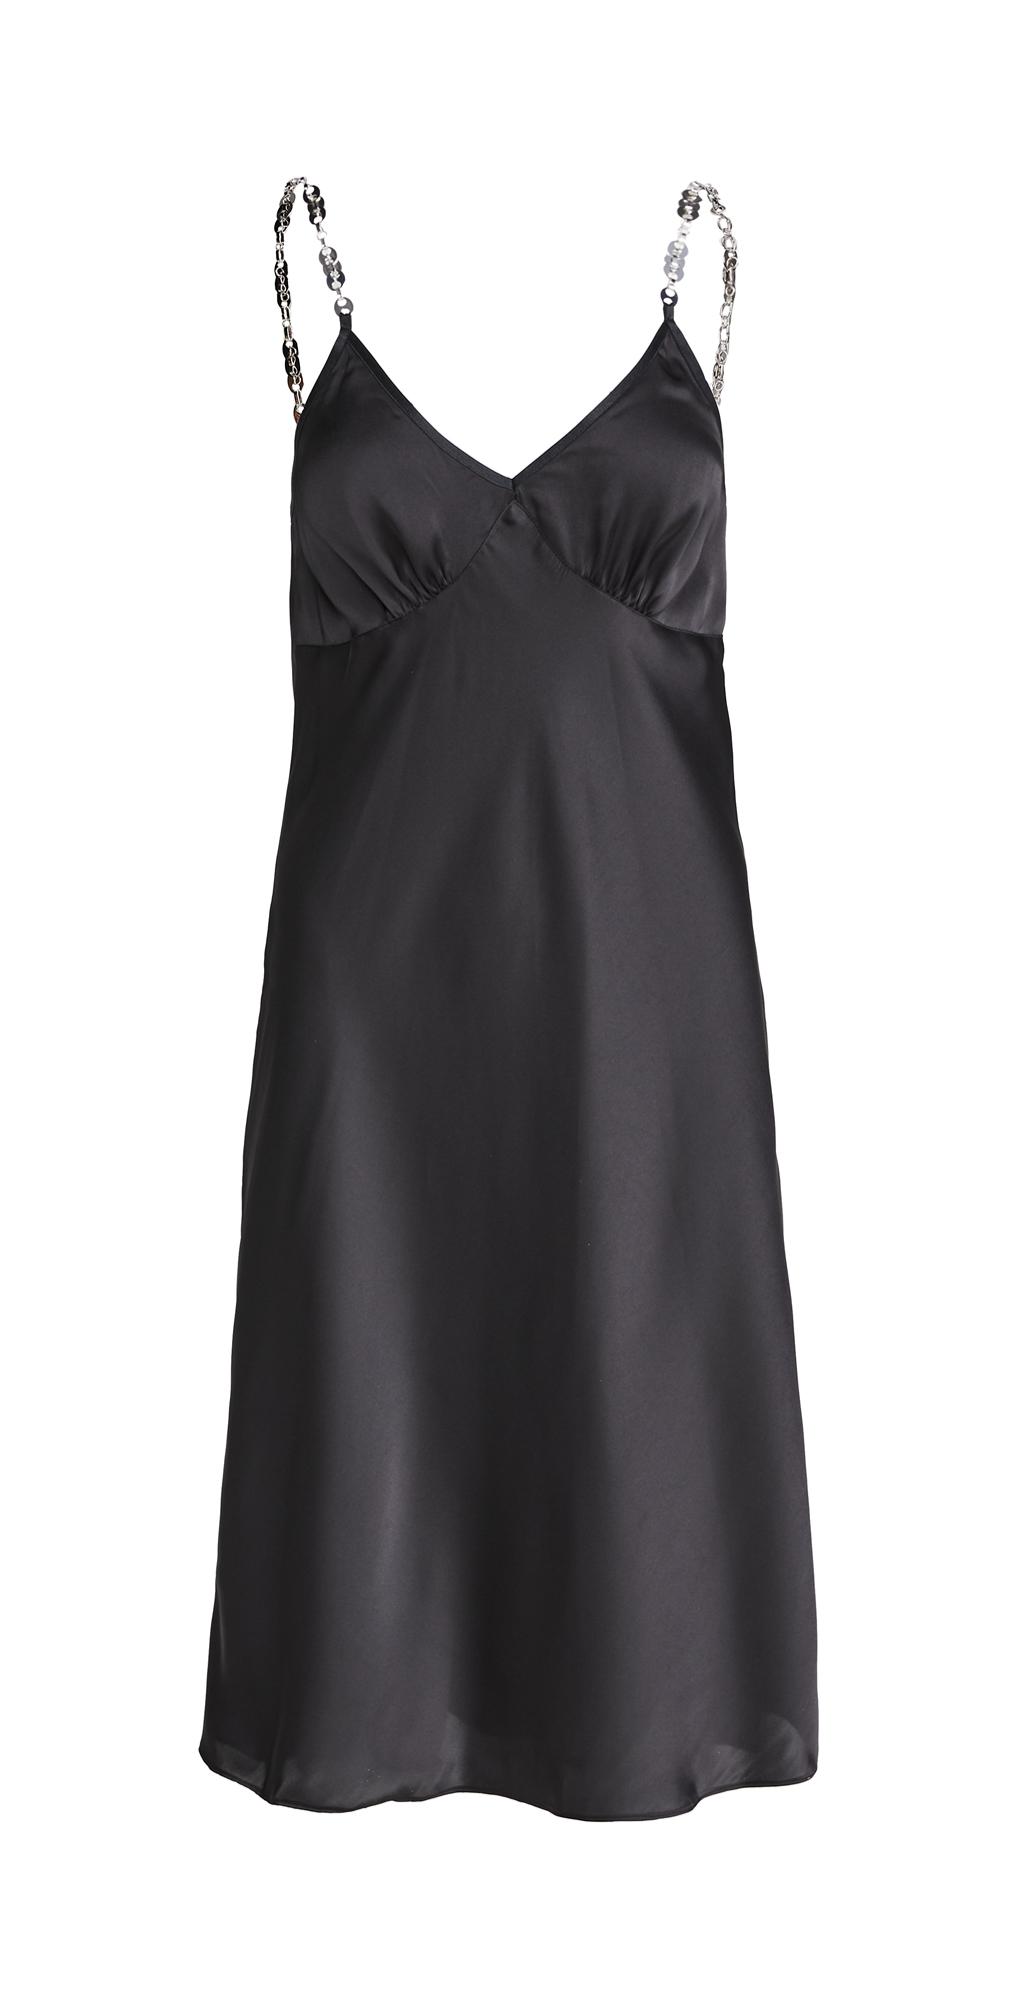 Paco Rabanne Satin Slip Dress